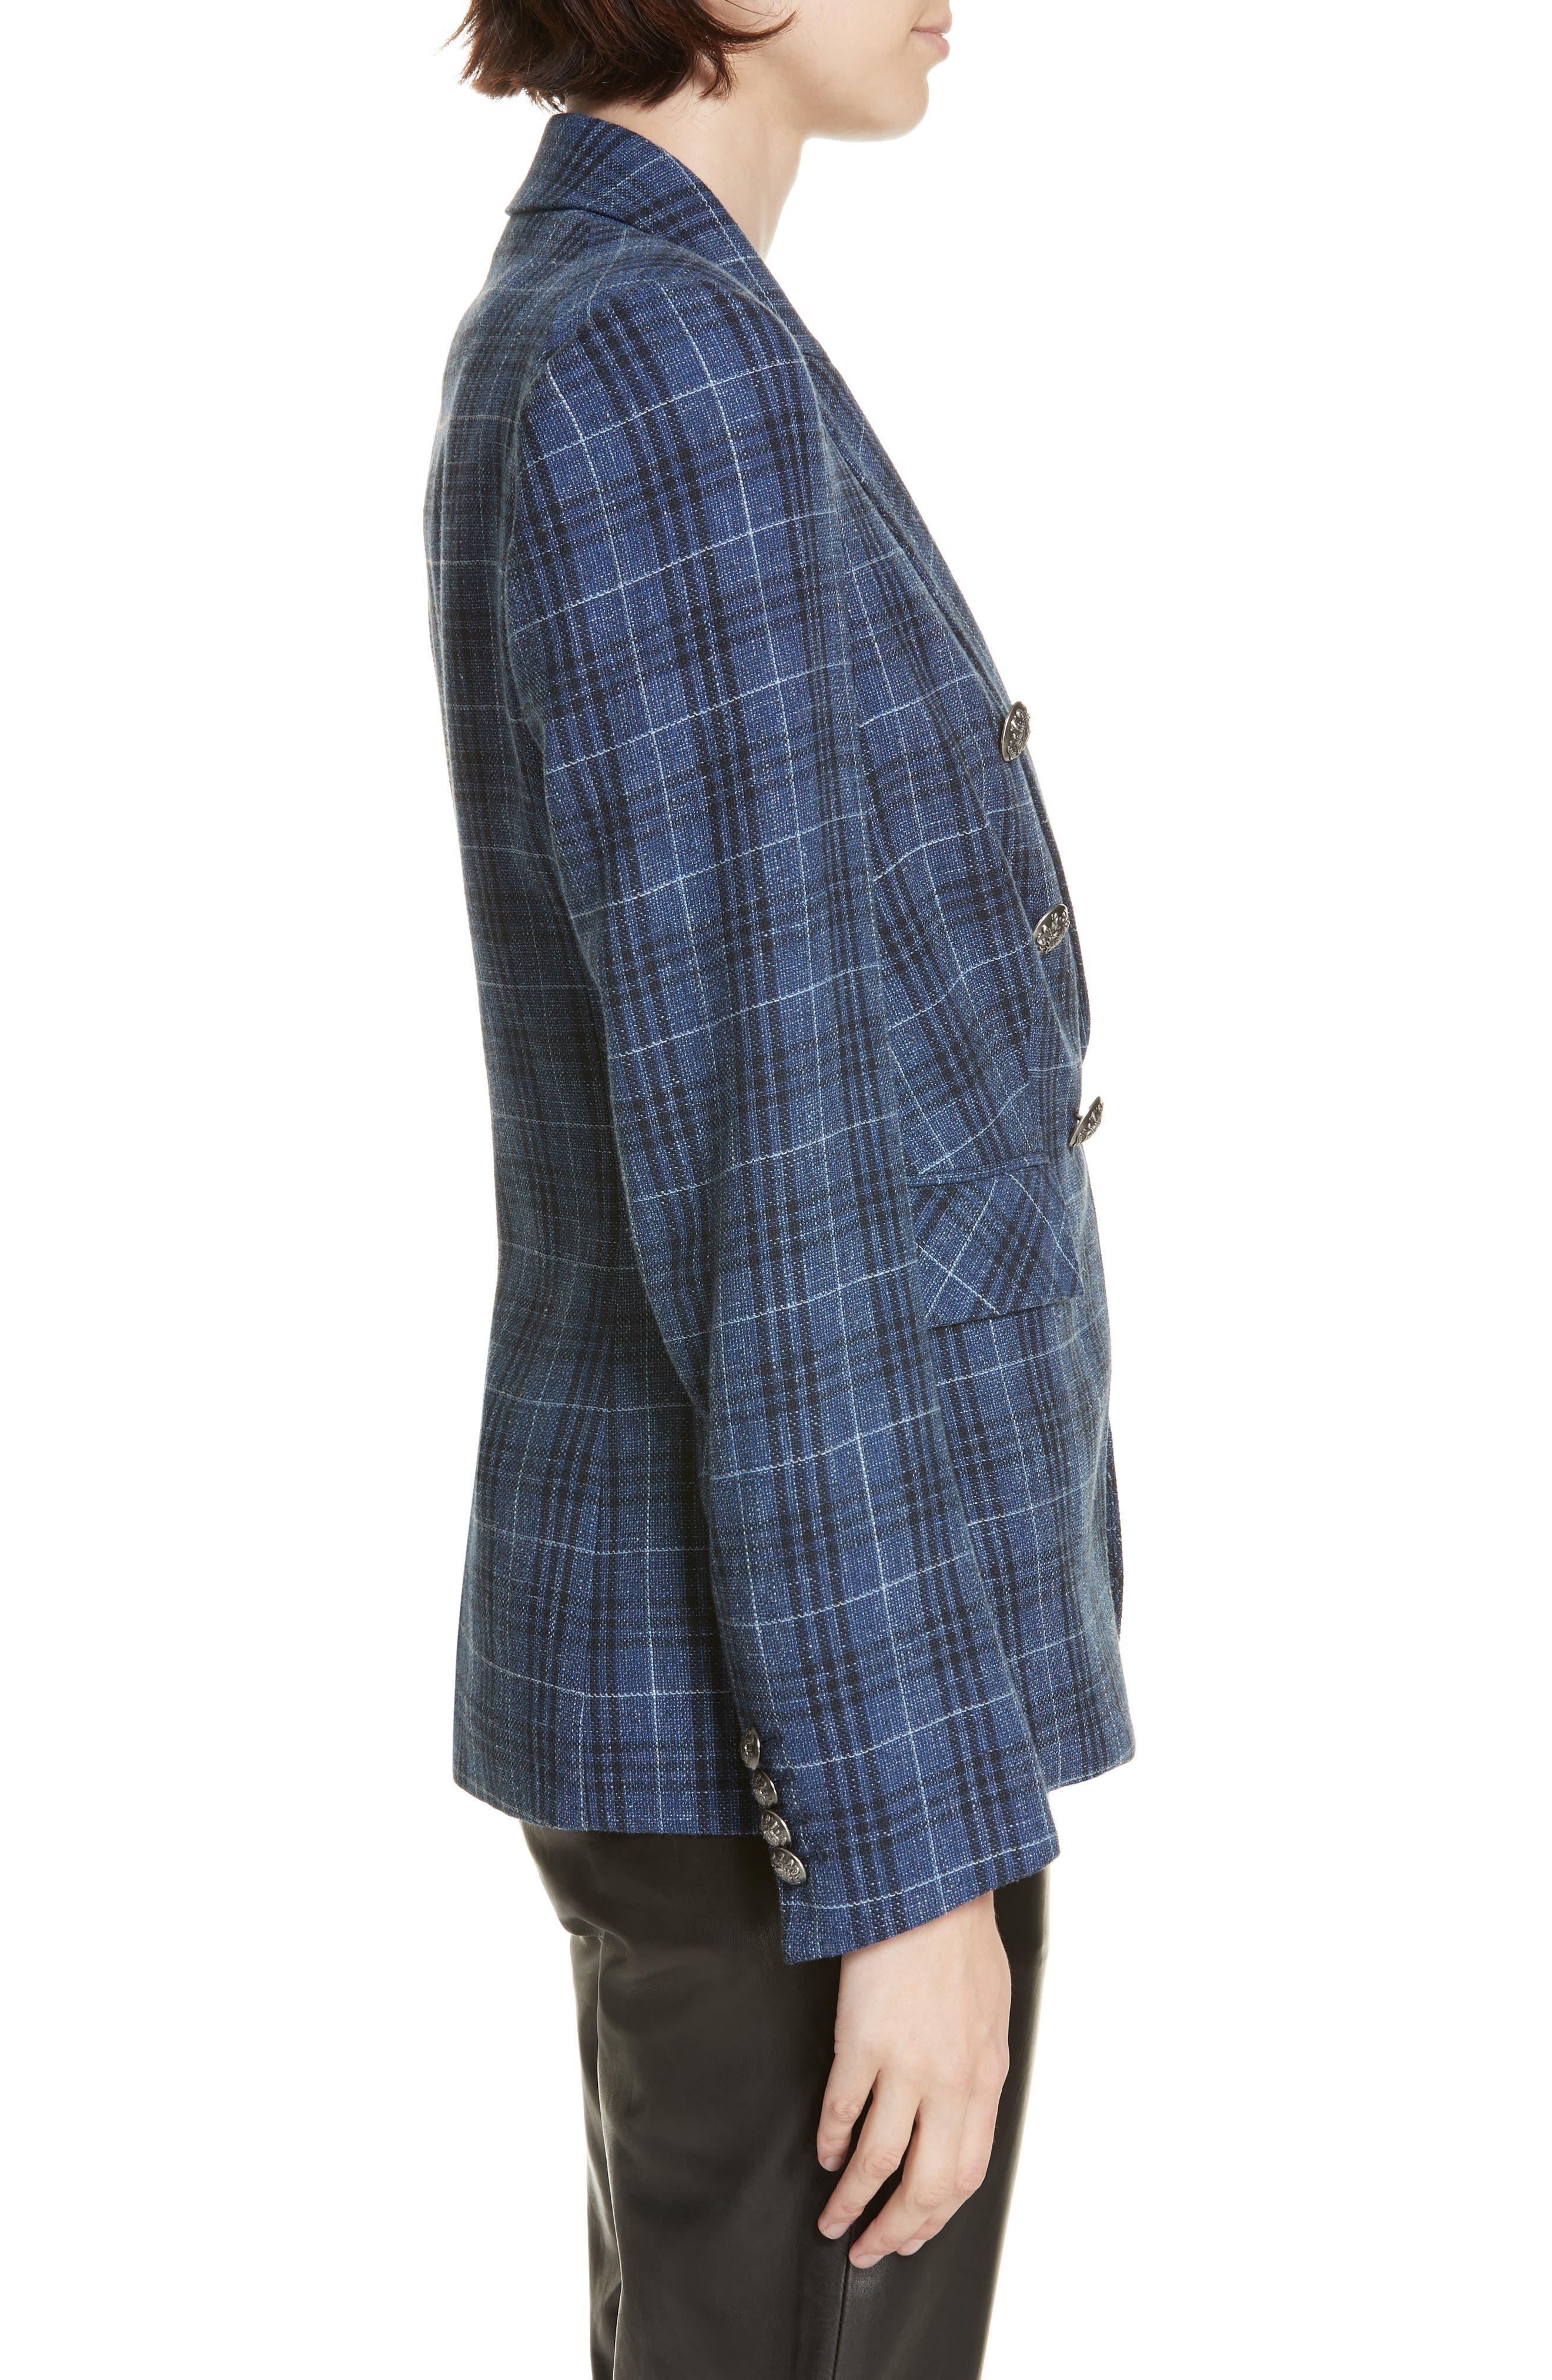 VERONICA BEARD,                             Miller Wool Blend Plaid Dickey Jacket,                             Alternate thumbnail 4, color,                             BLUE